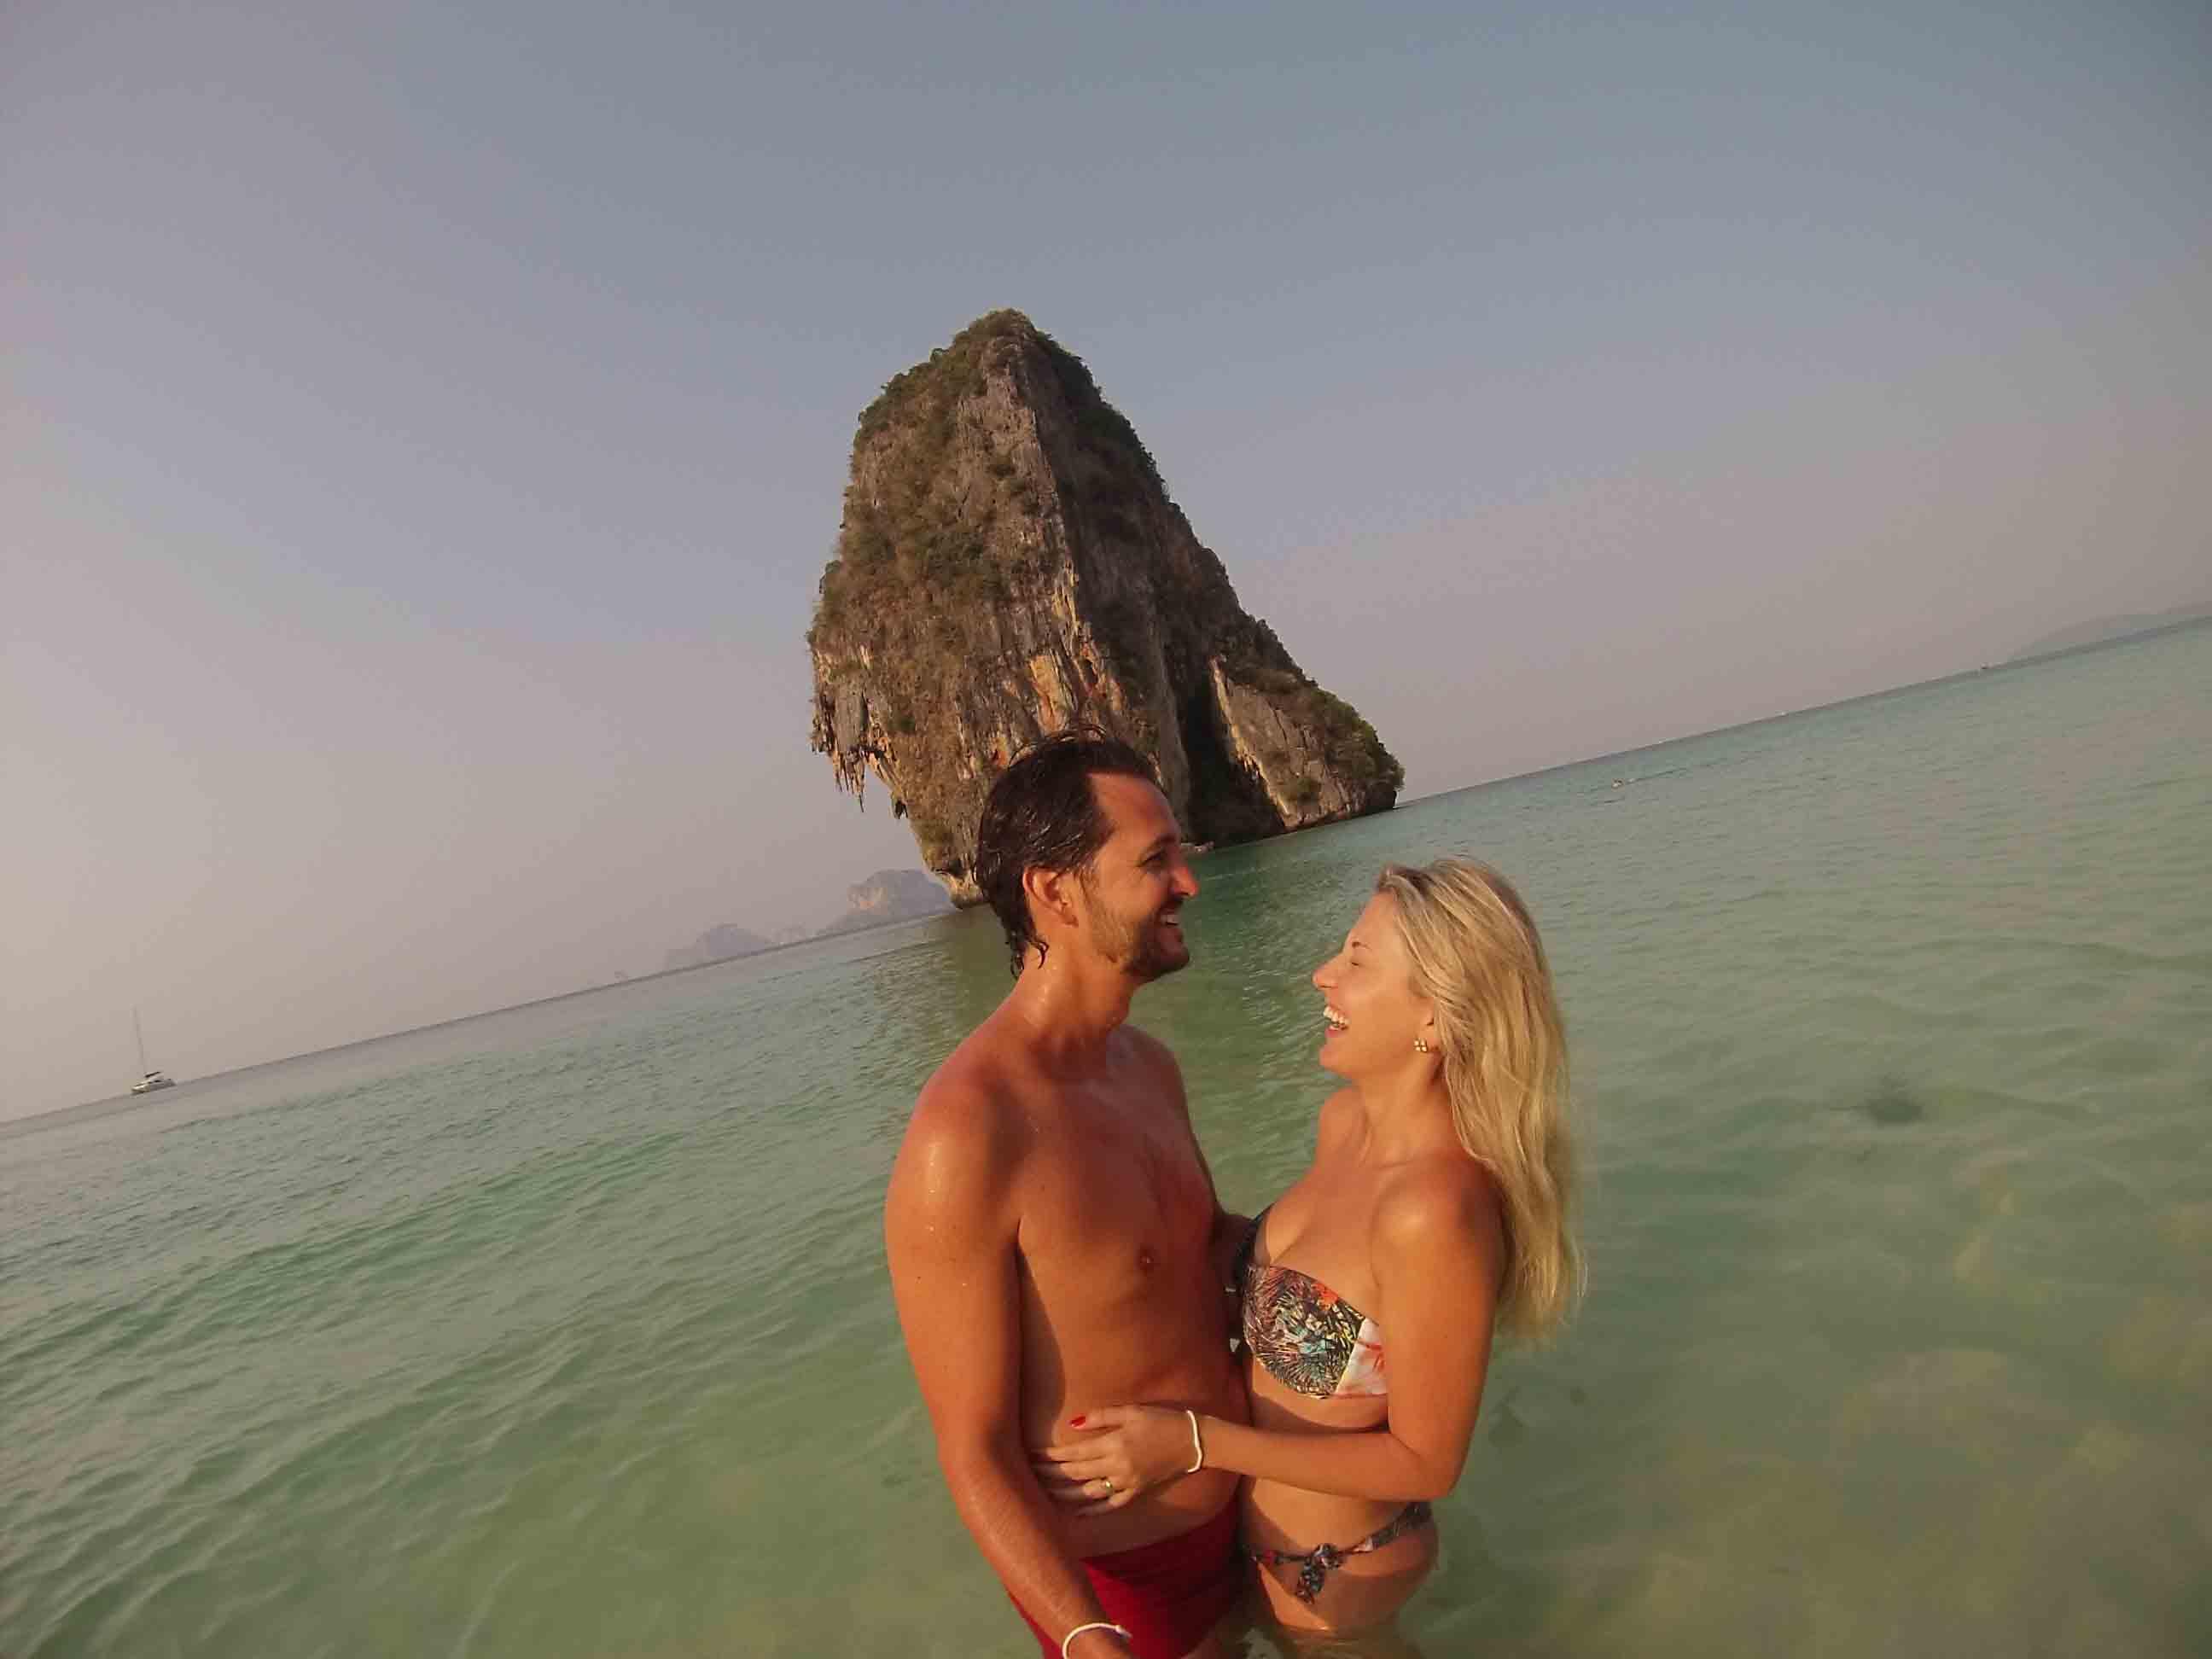 dicas de krabi - Phranang Cave Beach - praias da tailandia